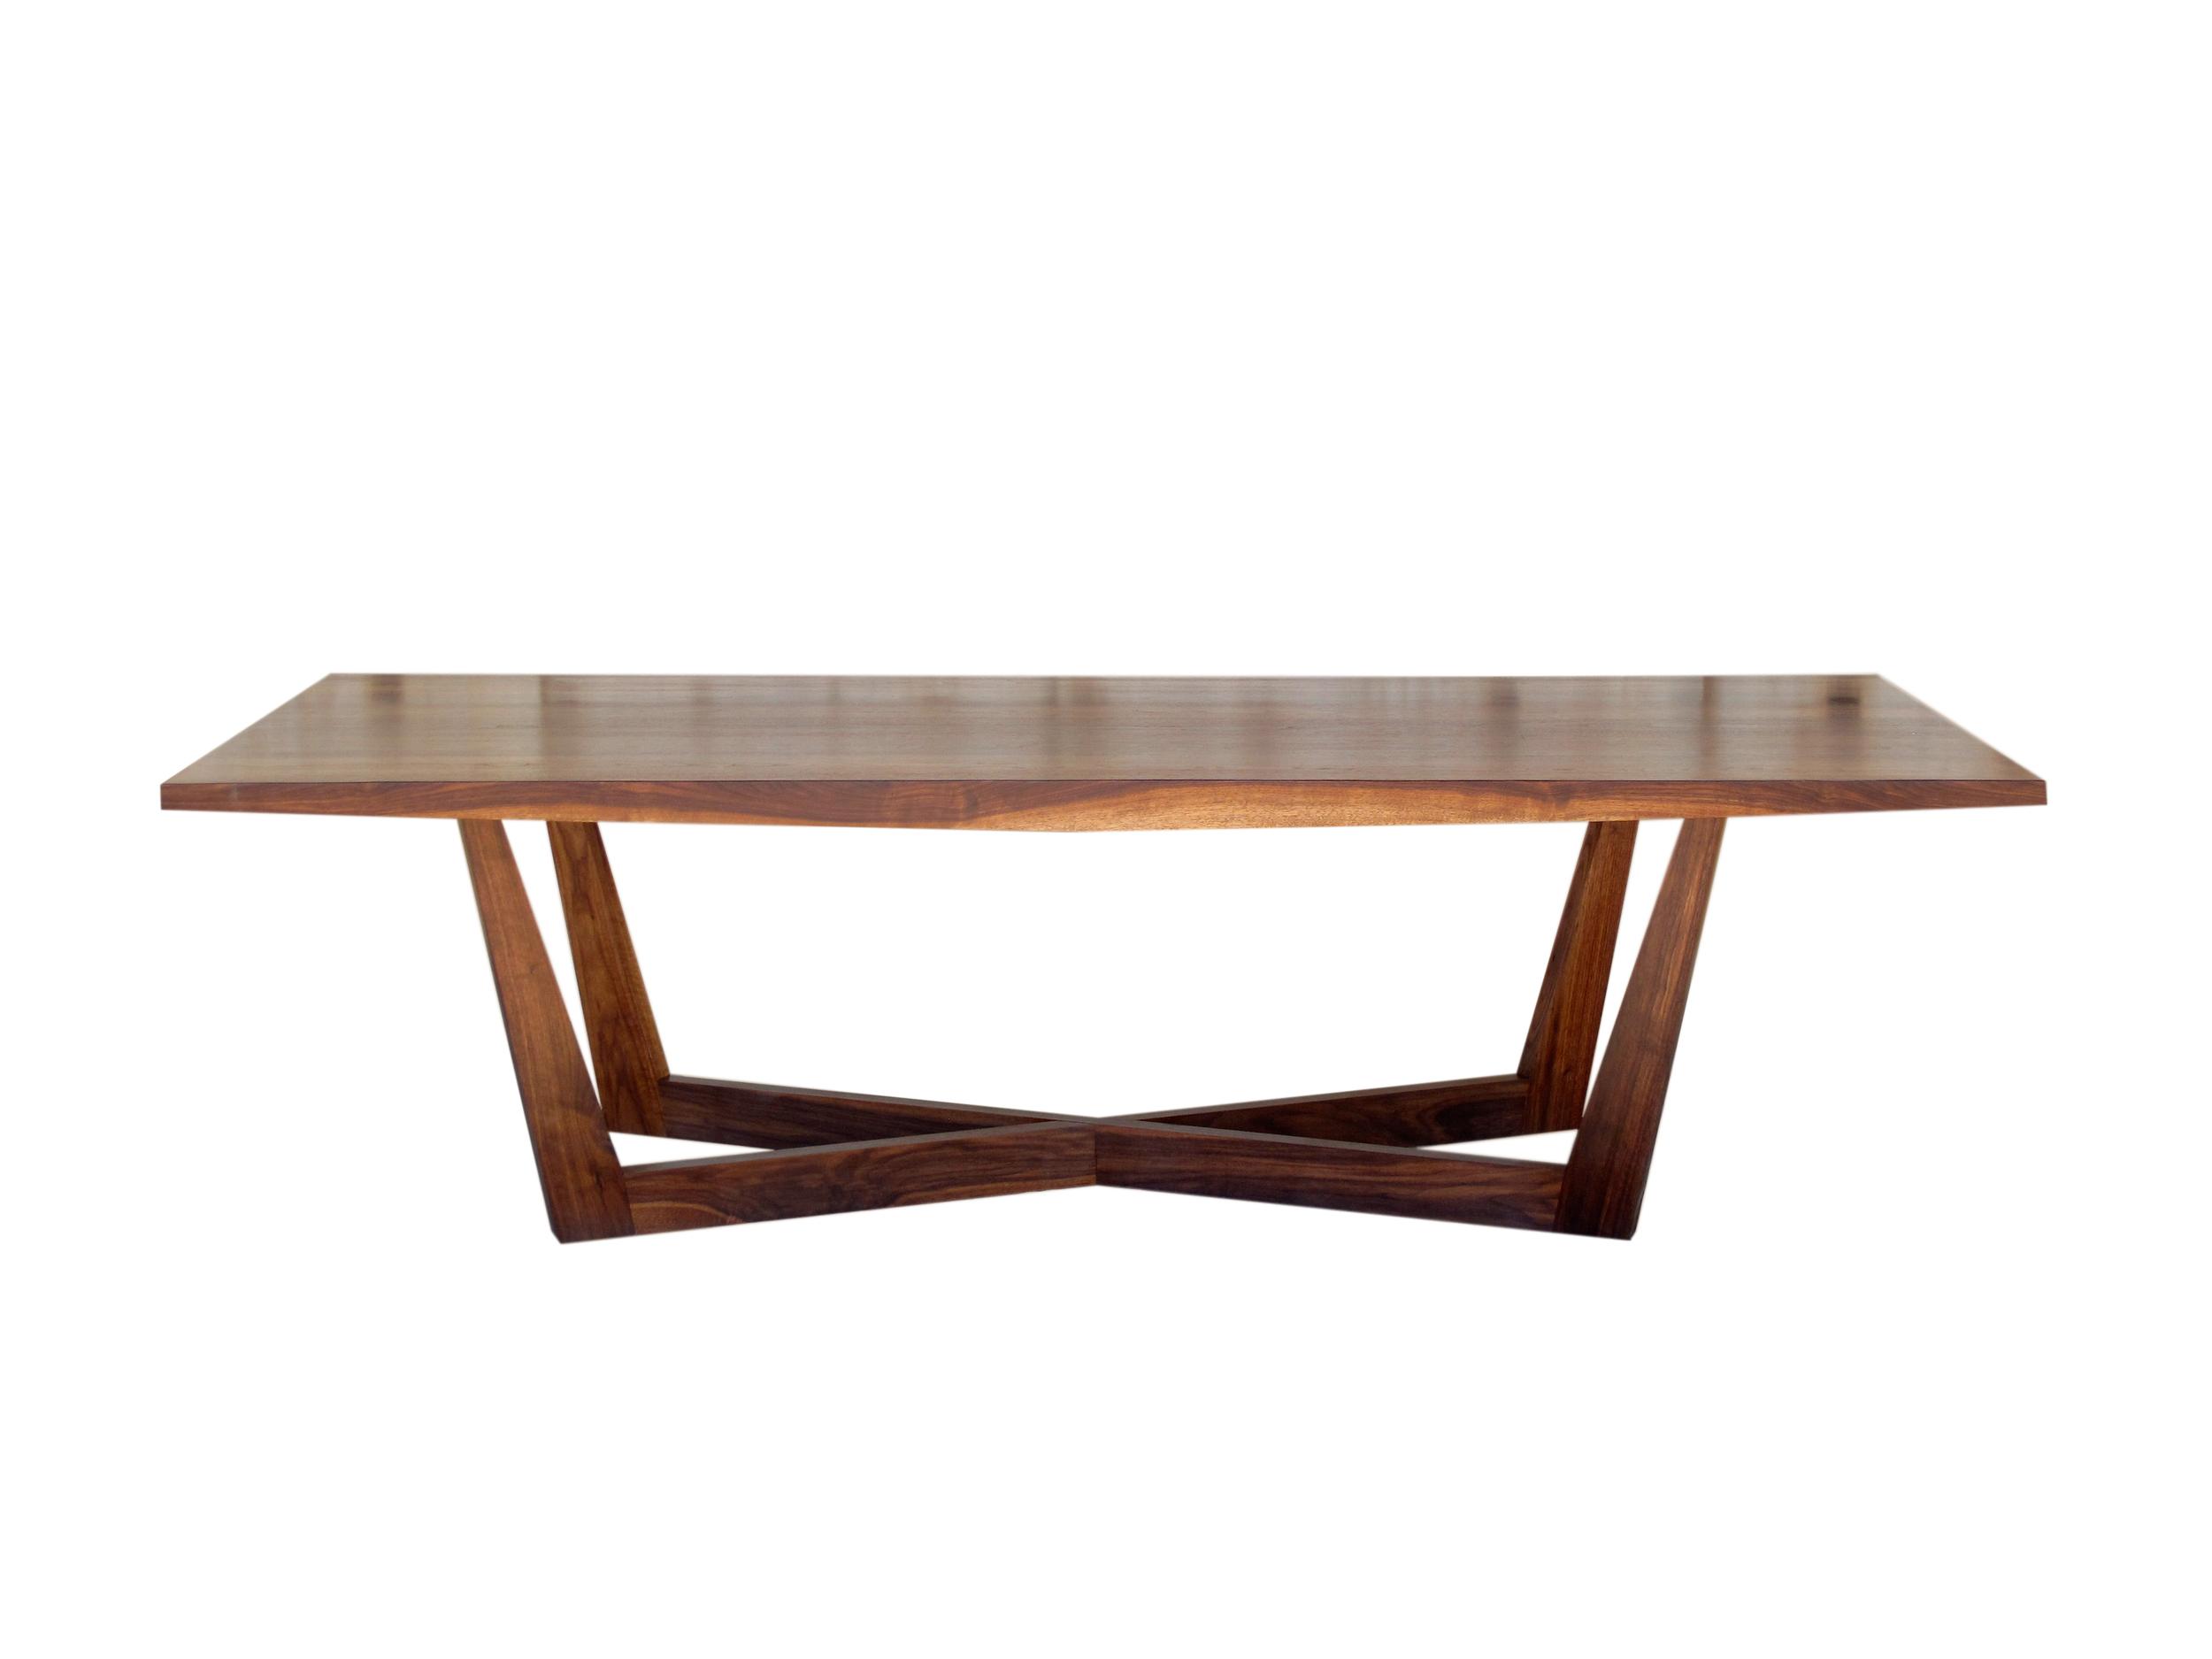 MONTAUK Table